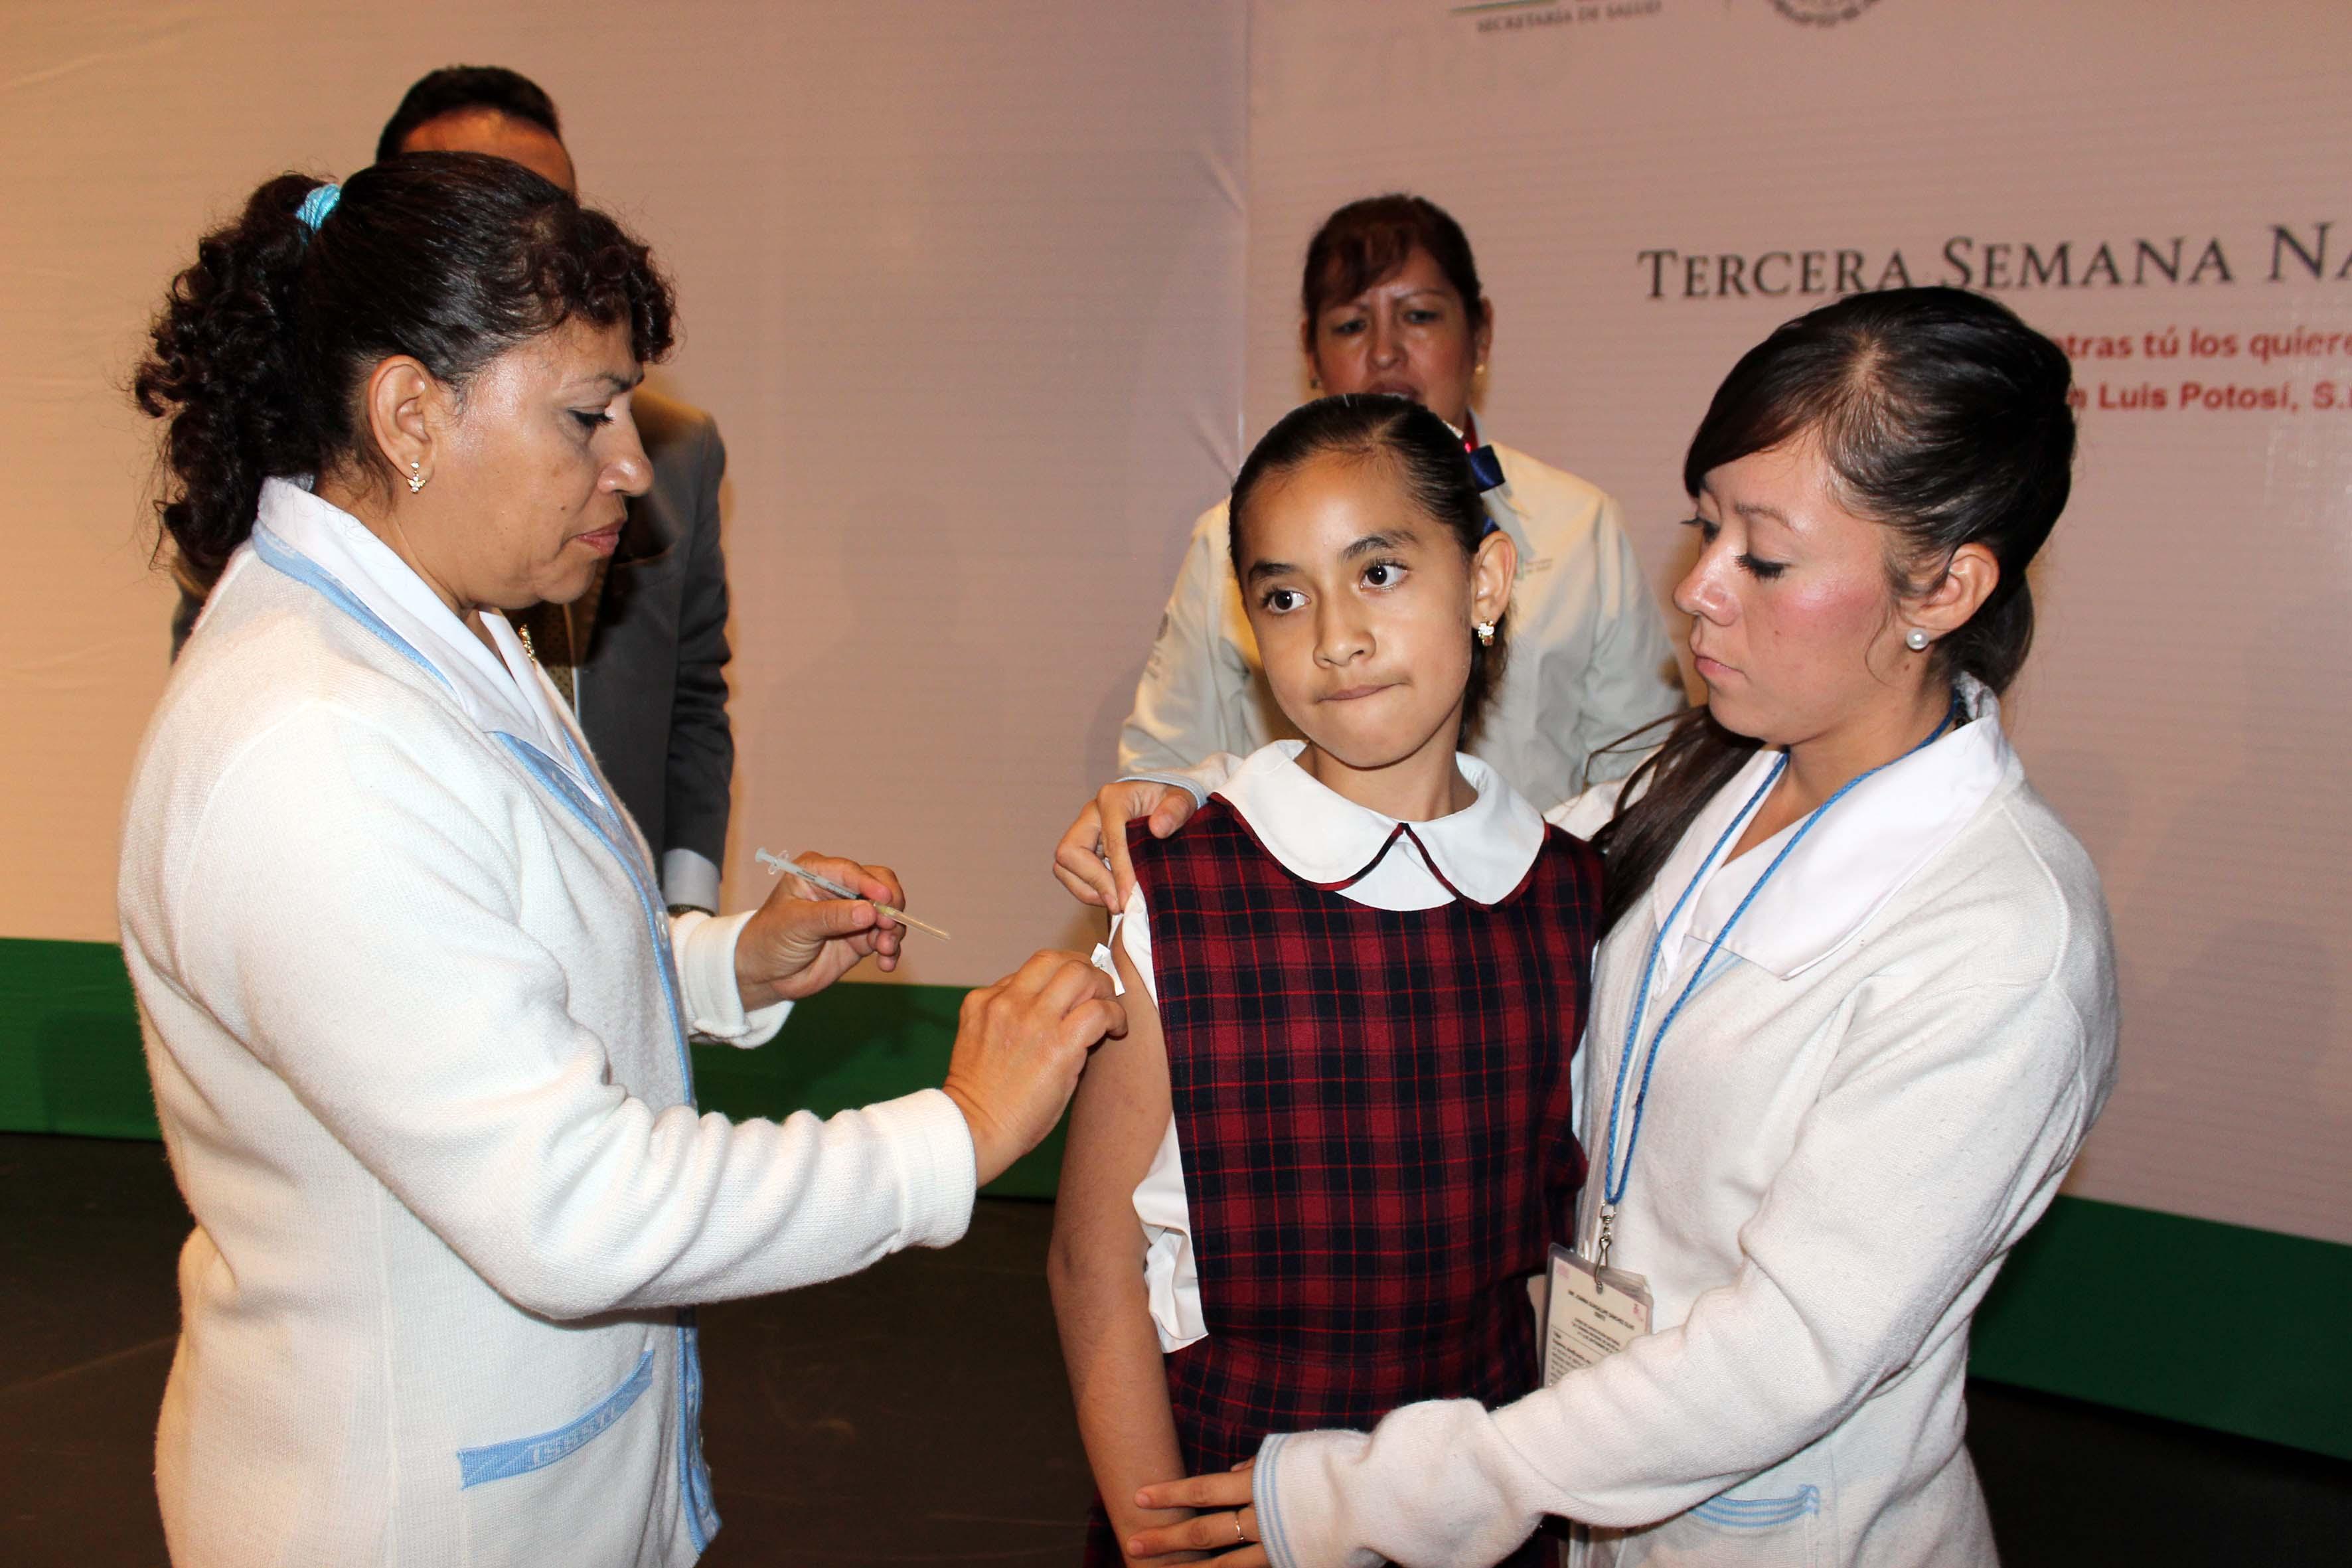 Tercera Semana Nacional de Salud 2014 SLP  5 jpg